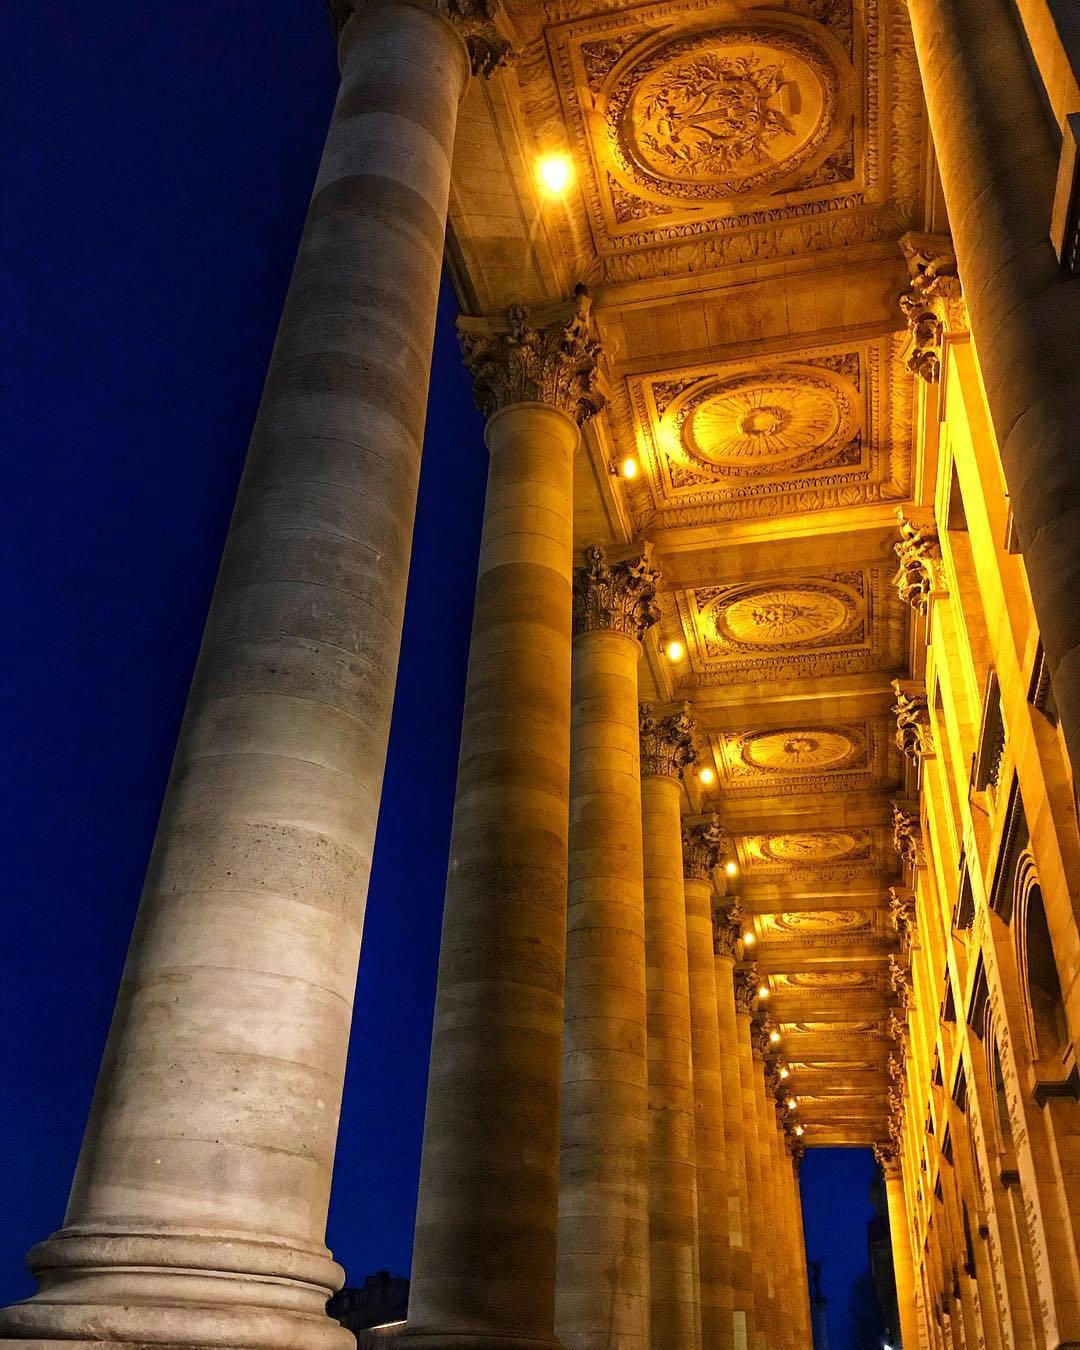 InterContinental Bordeaux Le Grand Hotel - Bordeaux, France - Night Architecture